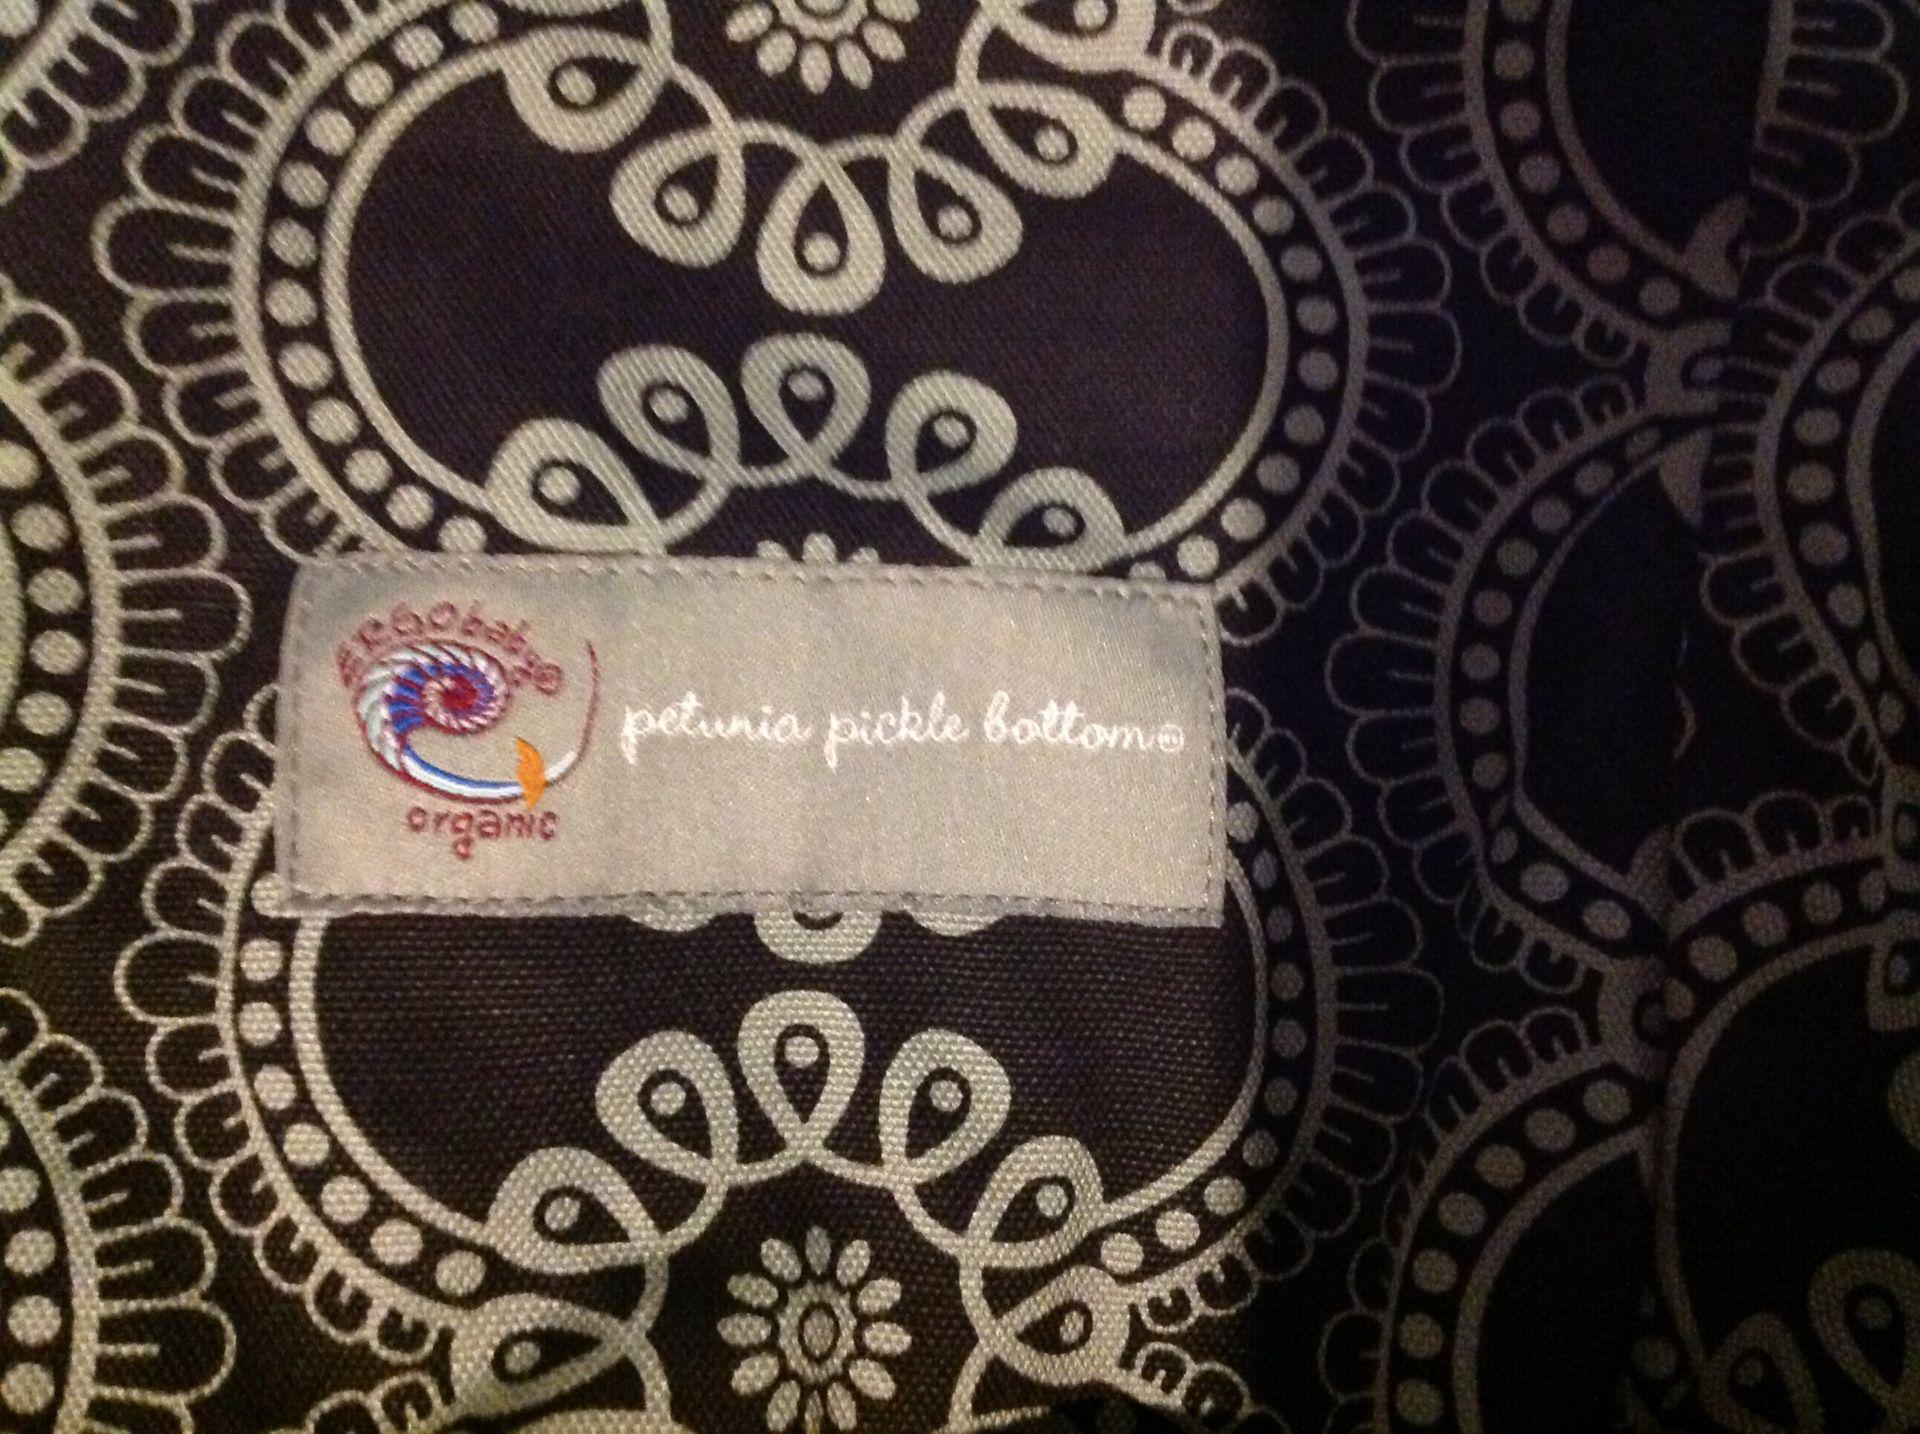 Petunia Pickle Bottom carrier, no insert